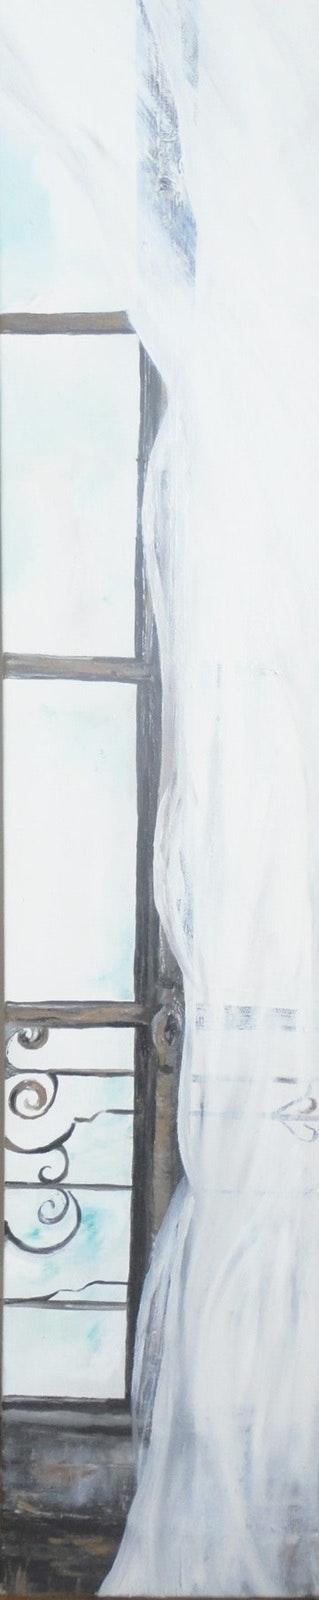 Fenêtre. Virginie Brieuc Virginie Brieuc